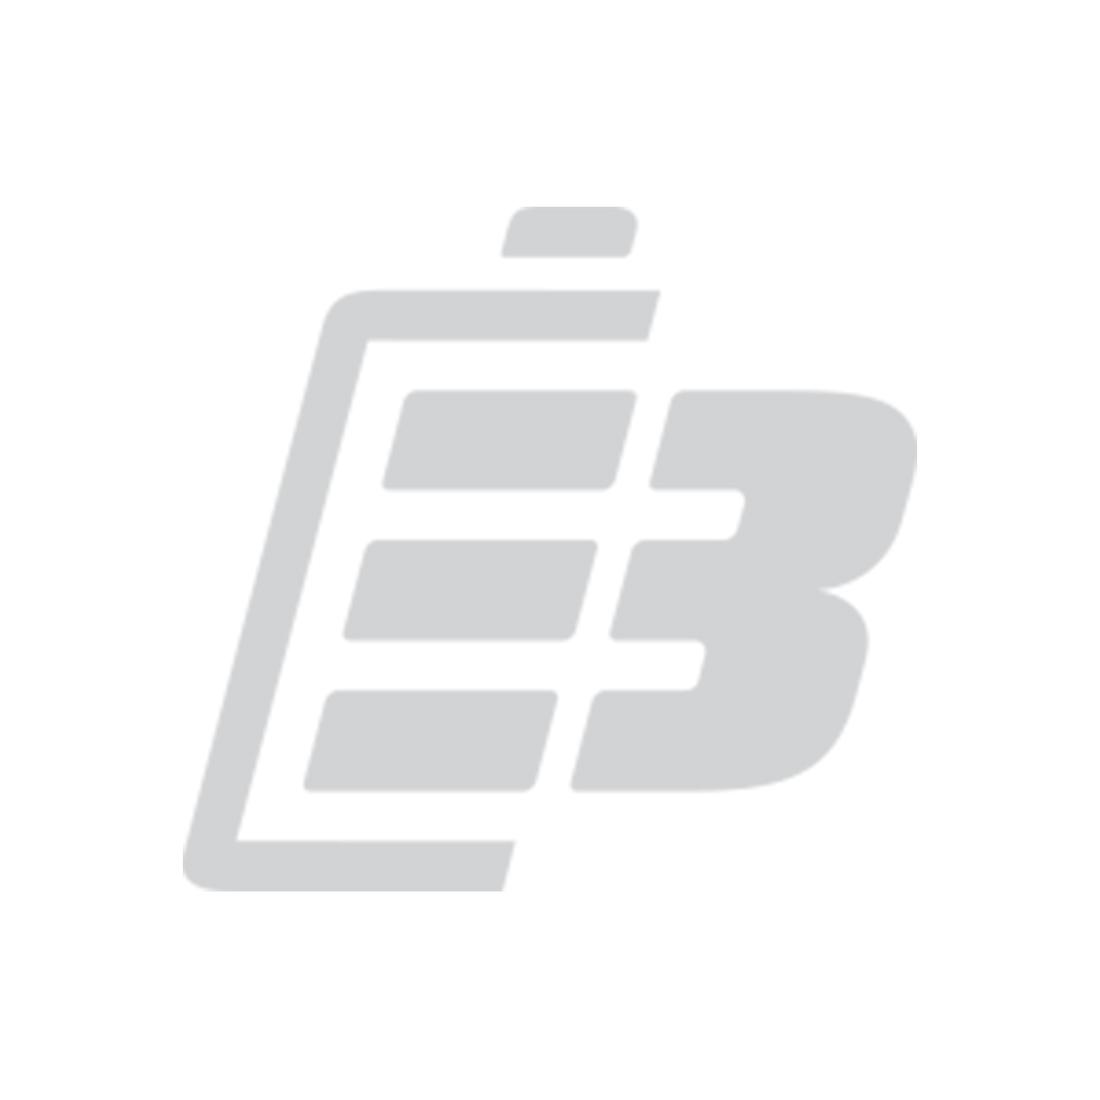 Procell Intense Power MX2400 AAA LR03